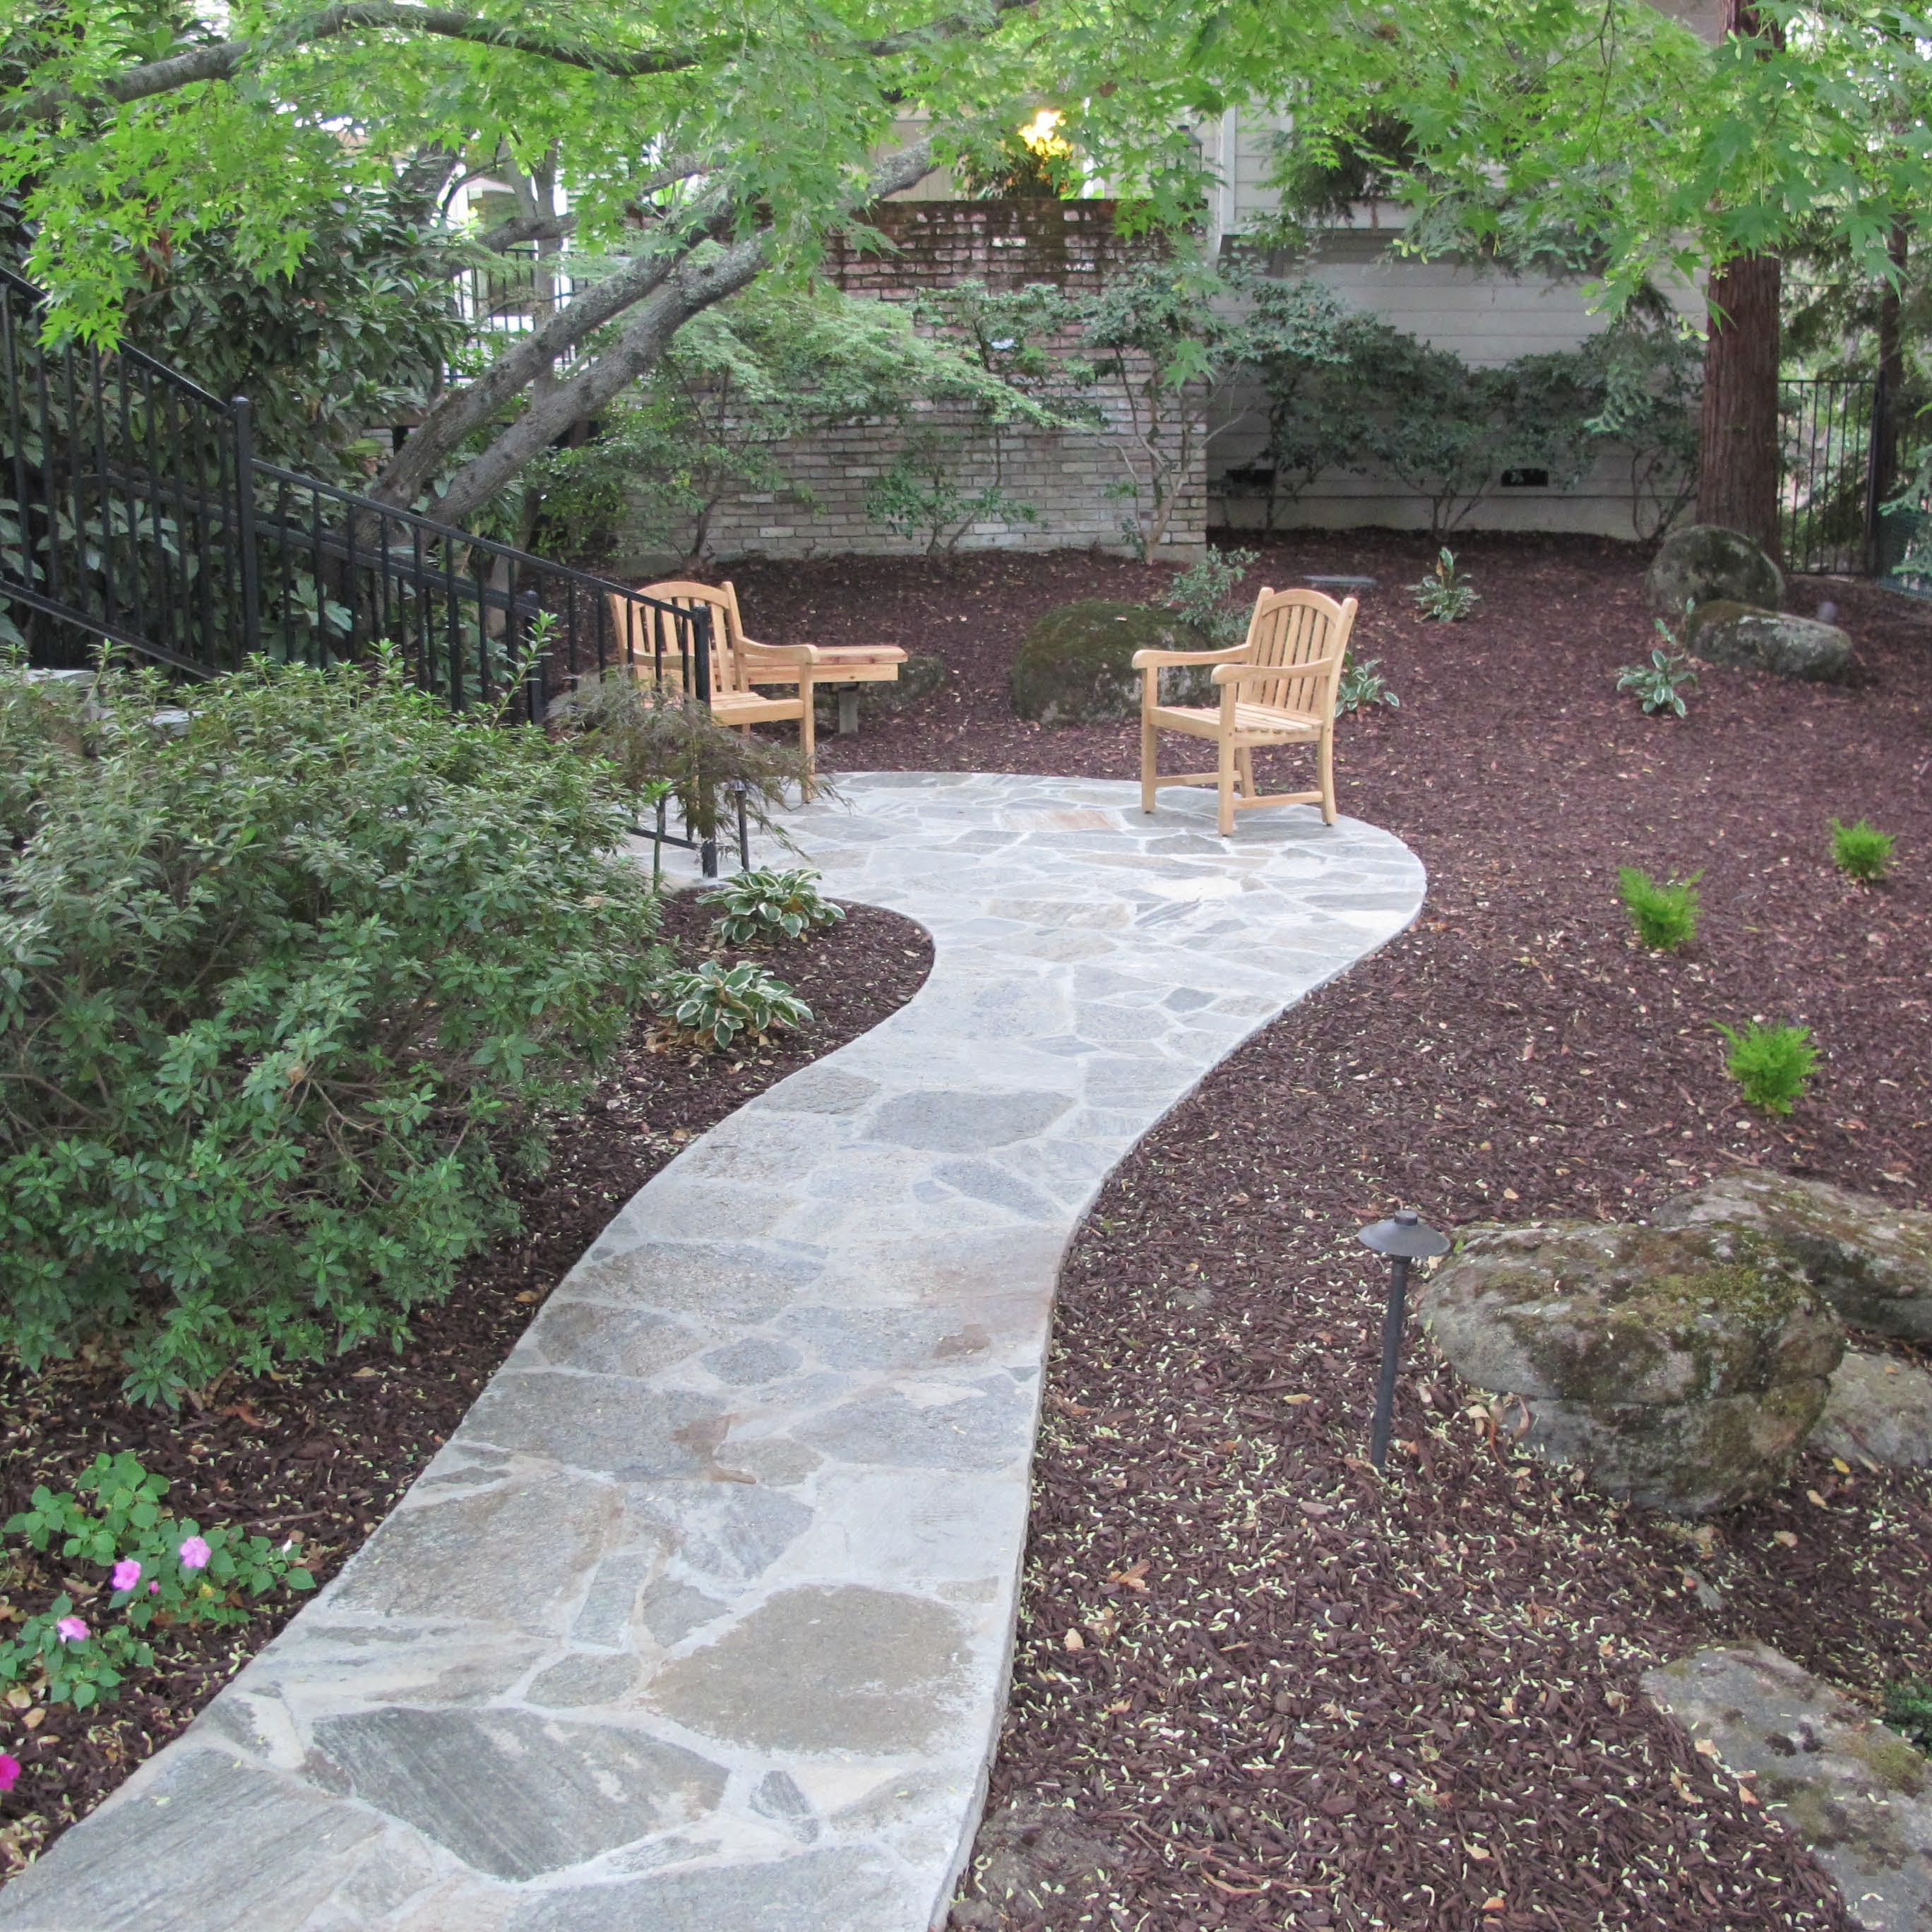 img 1781 copy flagstone pathway backyard patio large on extraordinary garden stone pathway ideas to copy id=33022